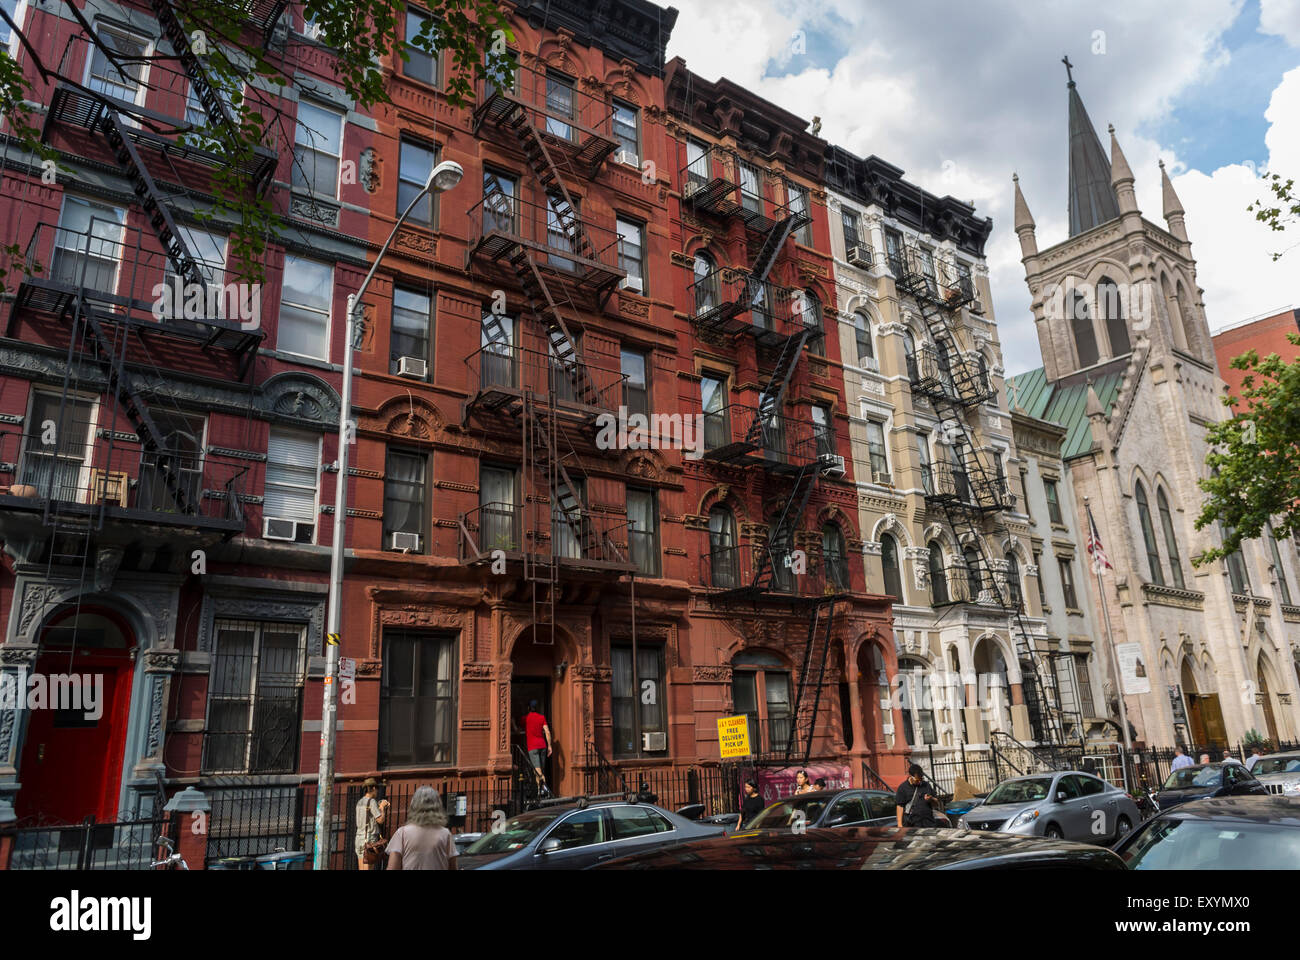 New York City Tenement Buildings Imágenes De Stock & New York City ...